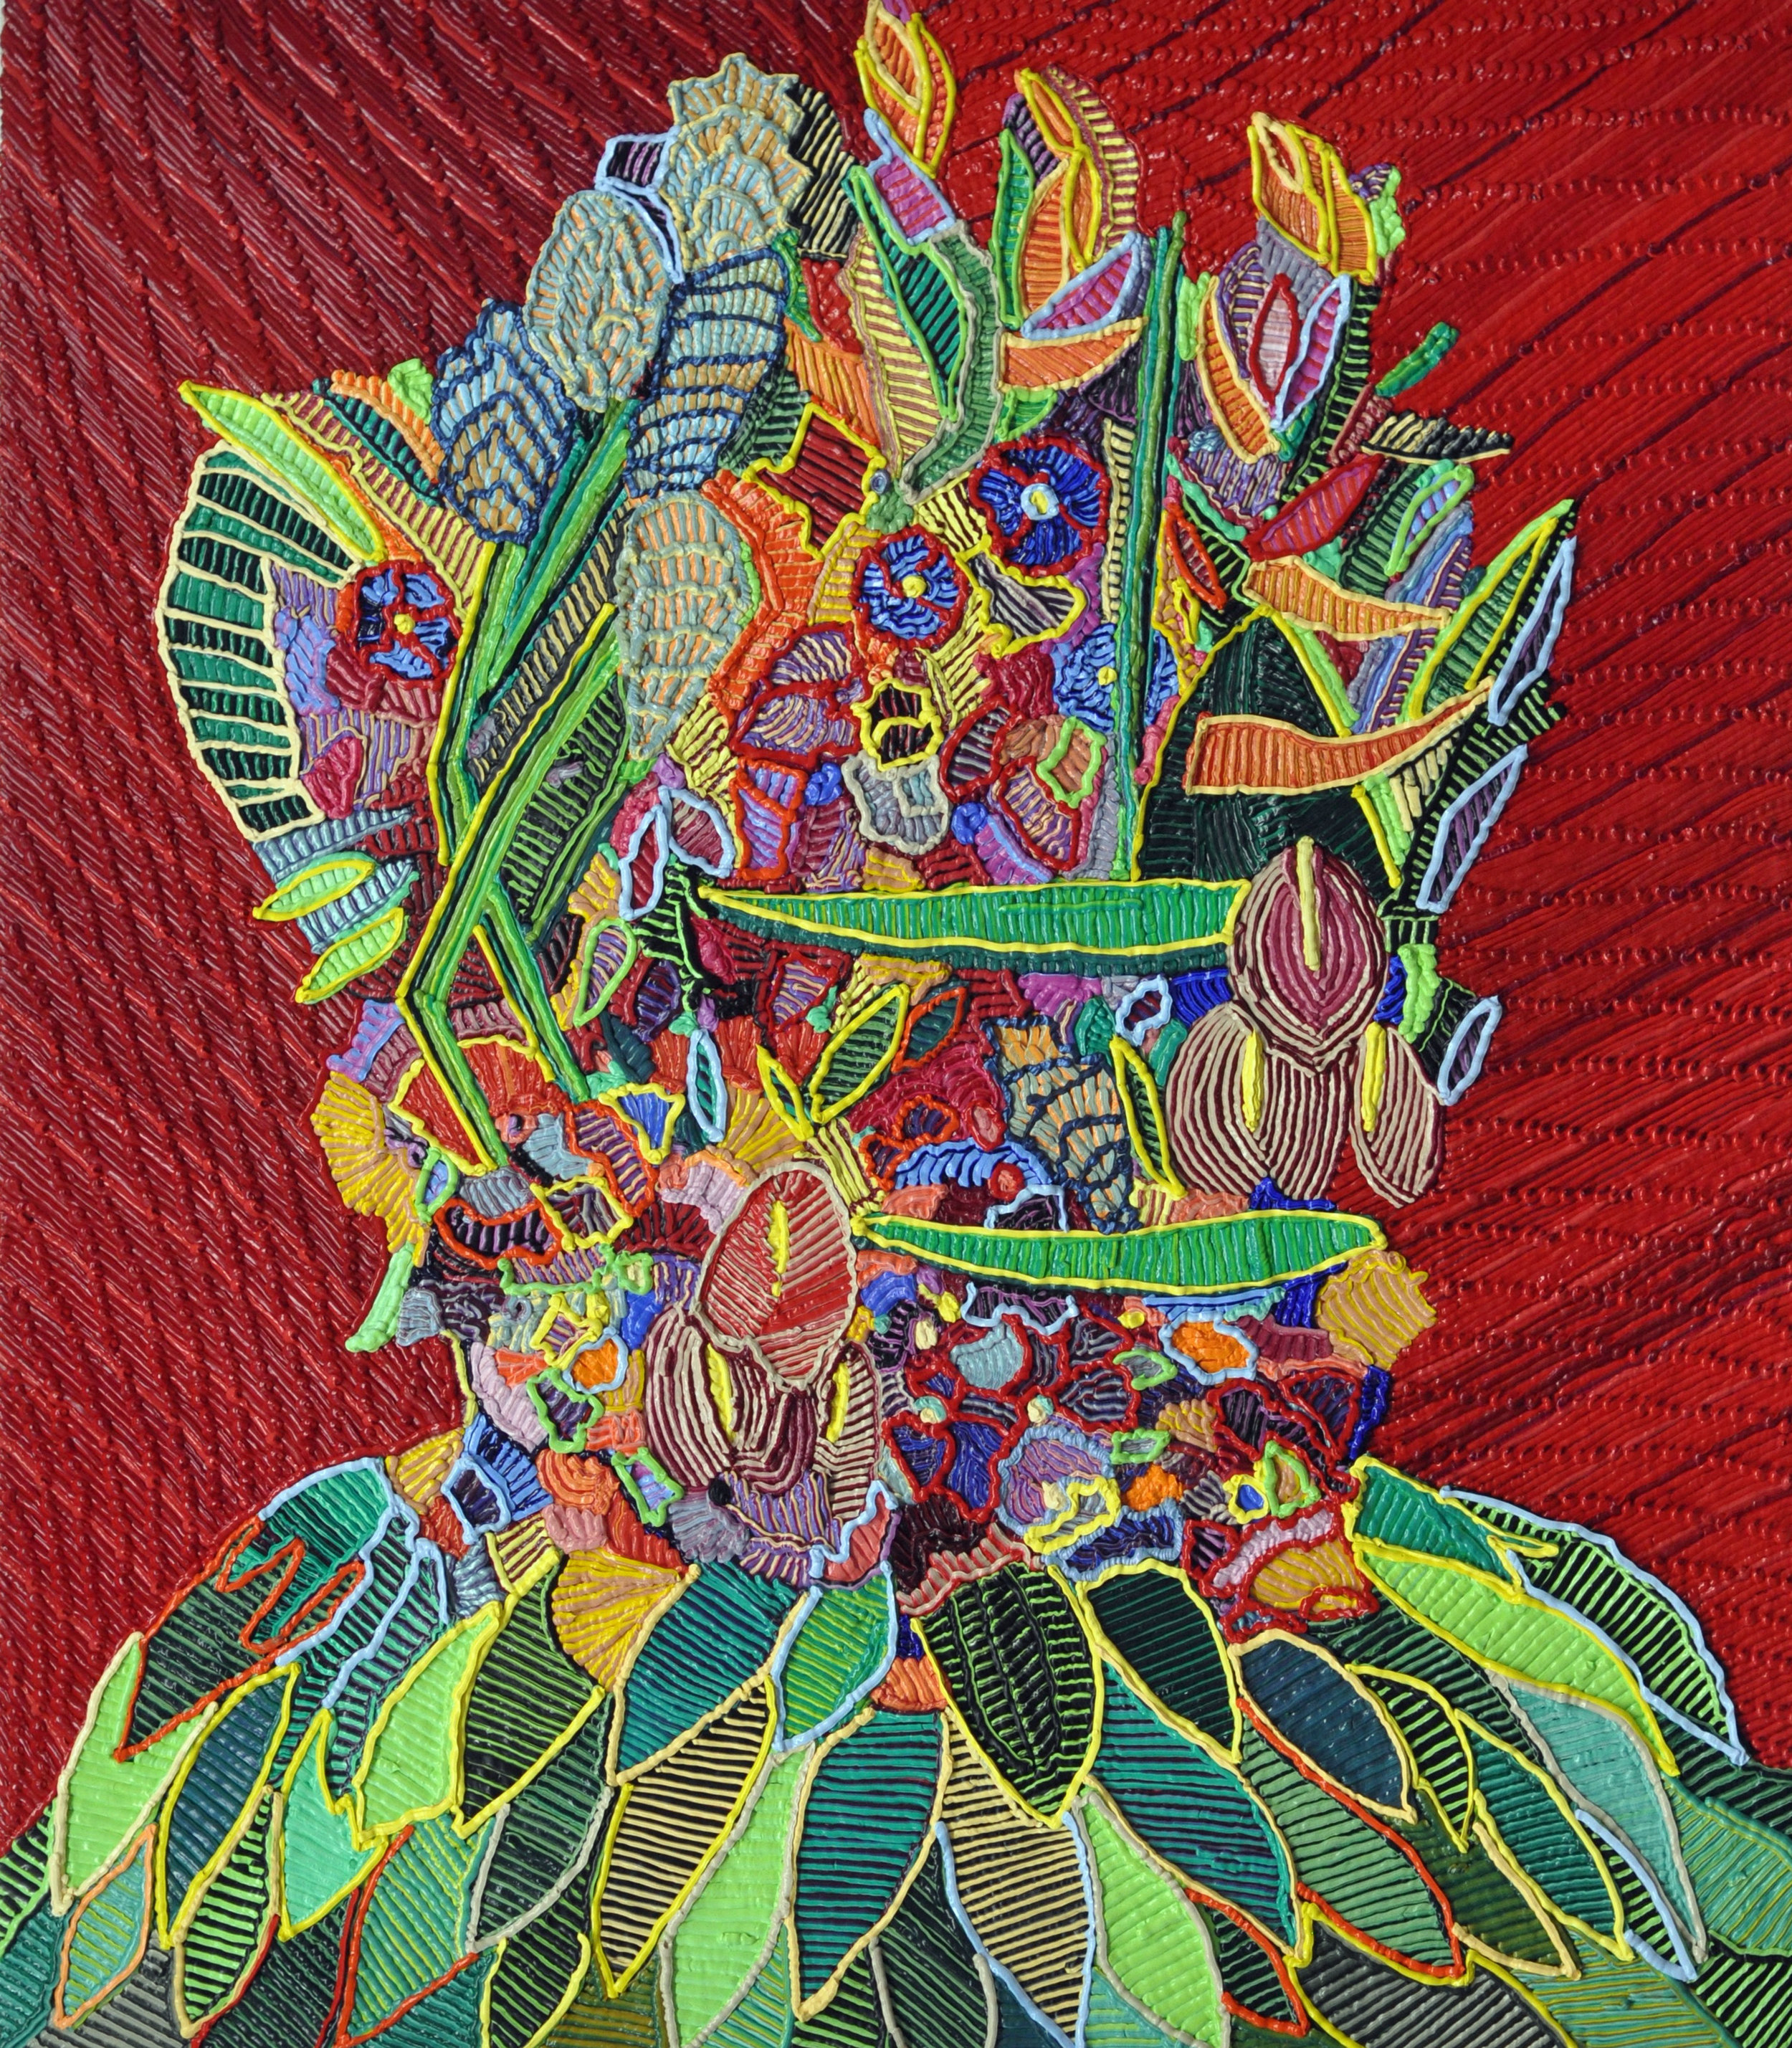 "Flora Body  oil on canvas  31 x 27"" 2017"